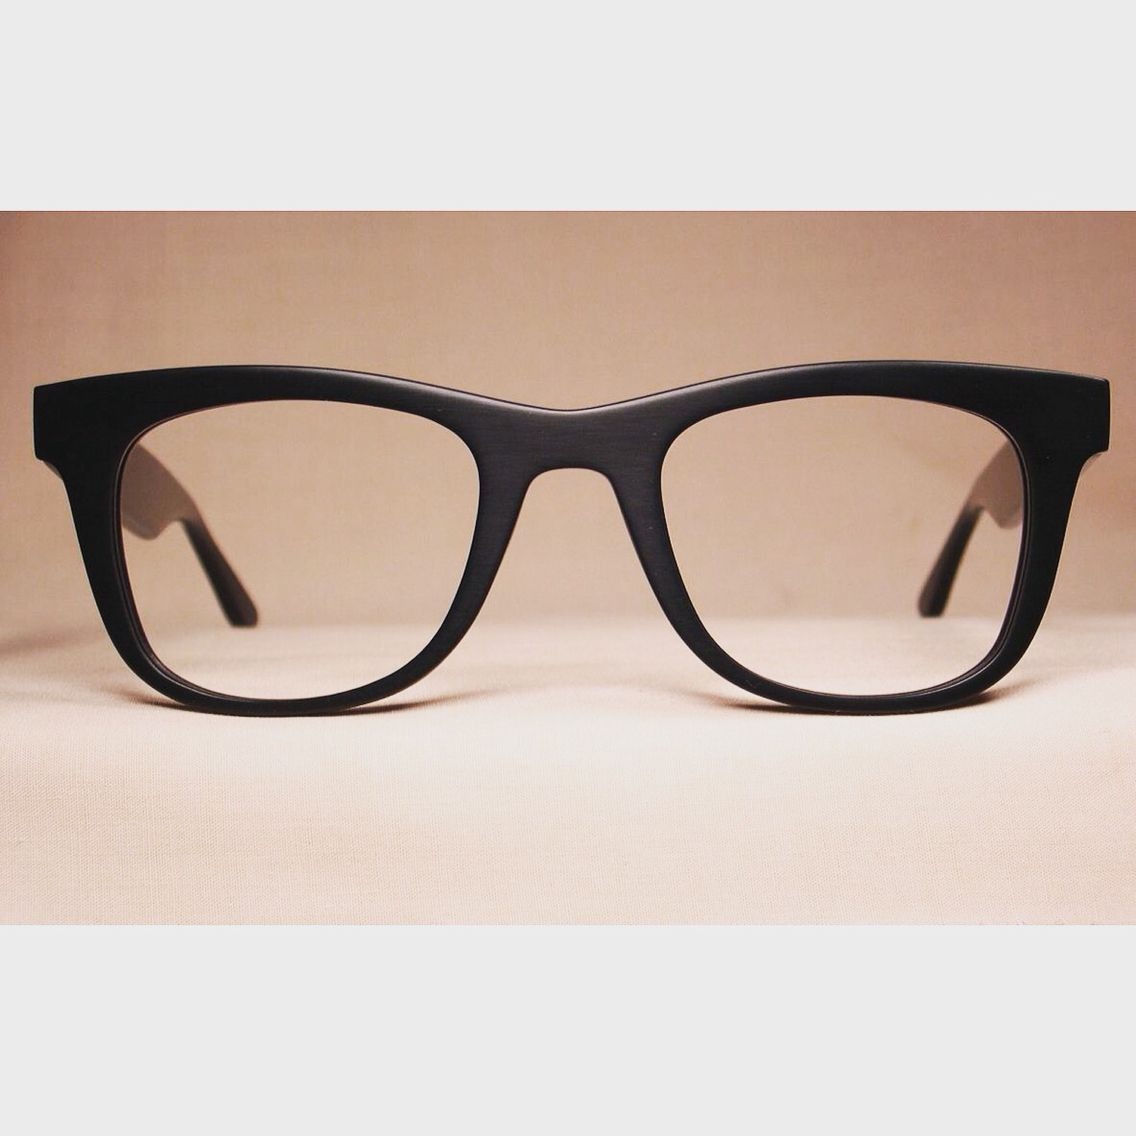 f7af3d708bbb Need a fresh pair of frames for  Fall  Treat yourself to  custom  eyewear.   Indivijual  bespoke  glasses  sunglasses  oneofakind  fashion  fallfashion    ...